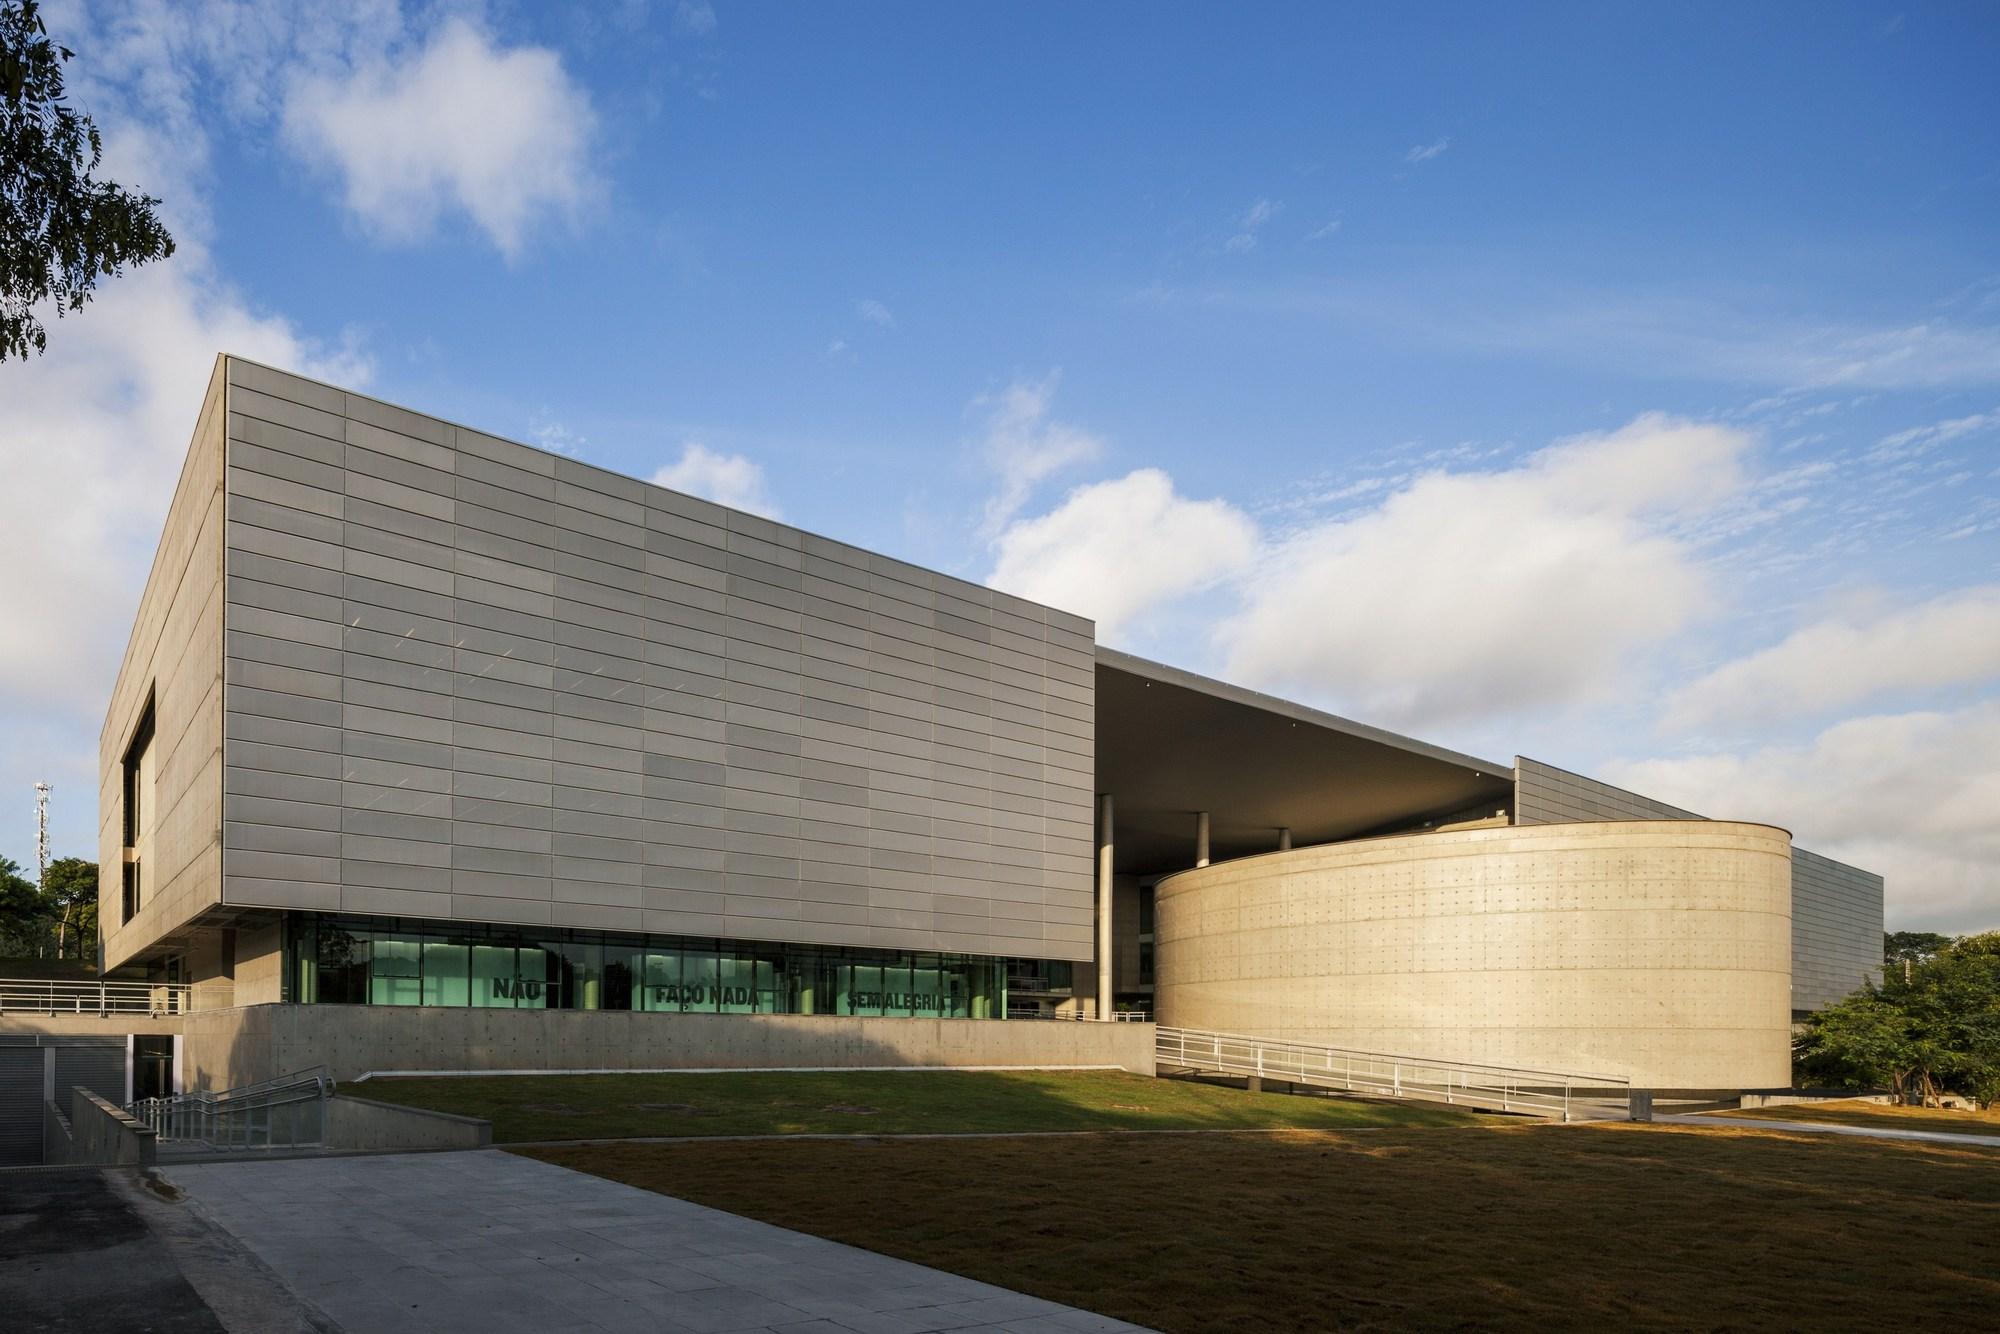 Biblioteca brasiliana eduardo de almeida mindlin loeb for Biblioteca arquitectura